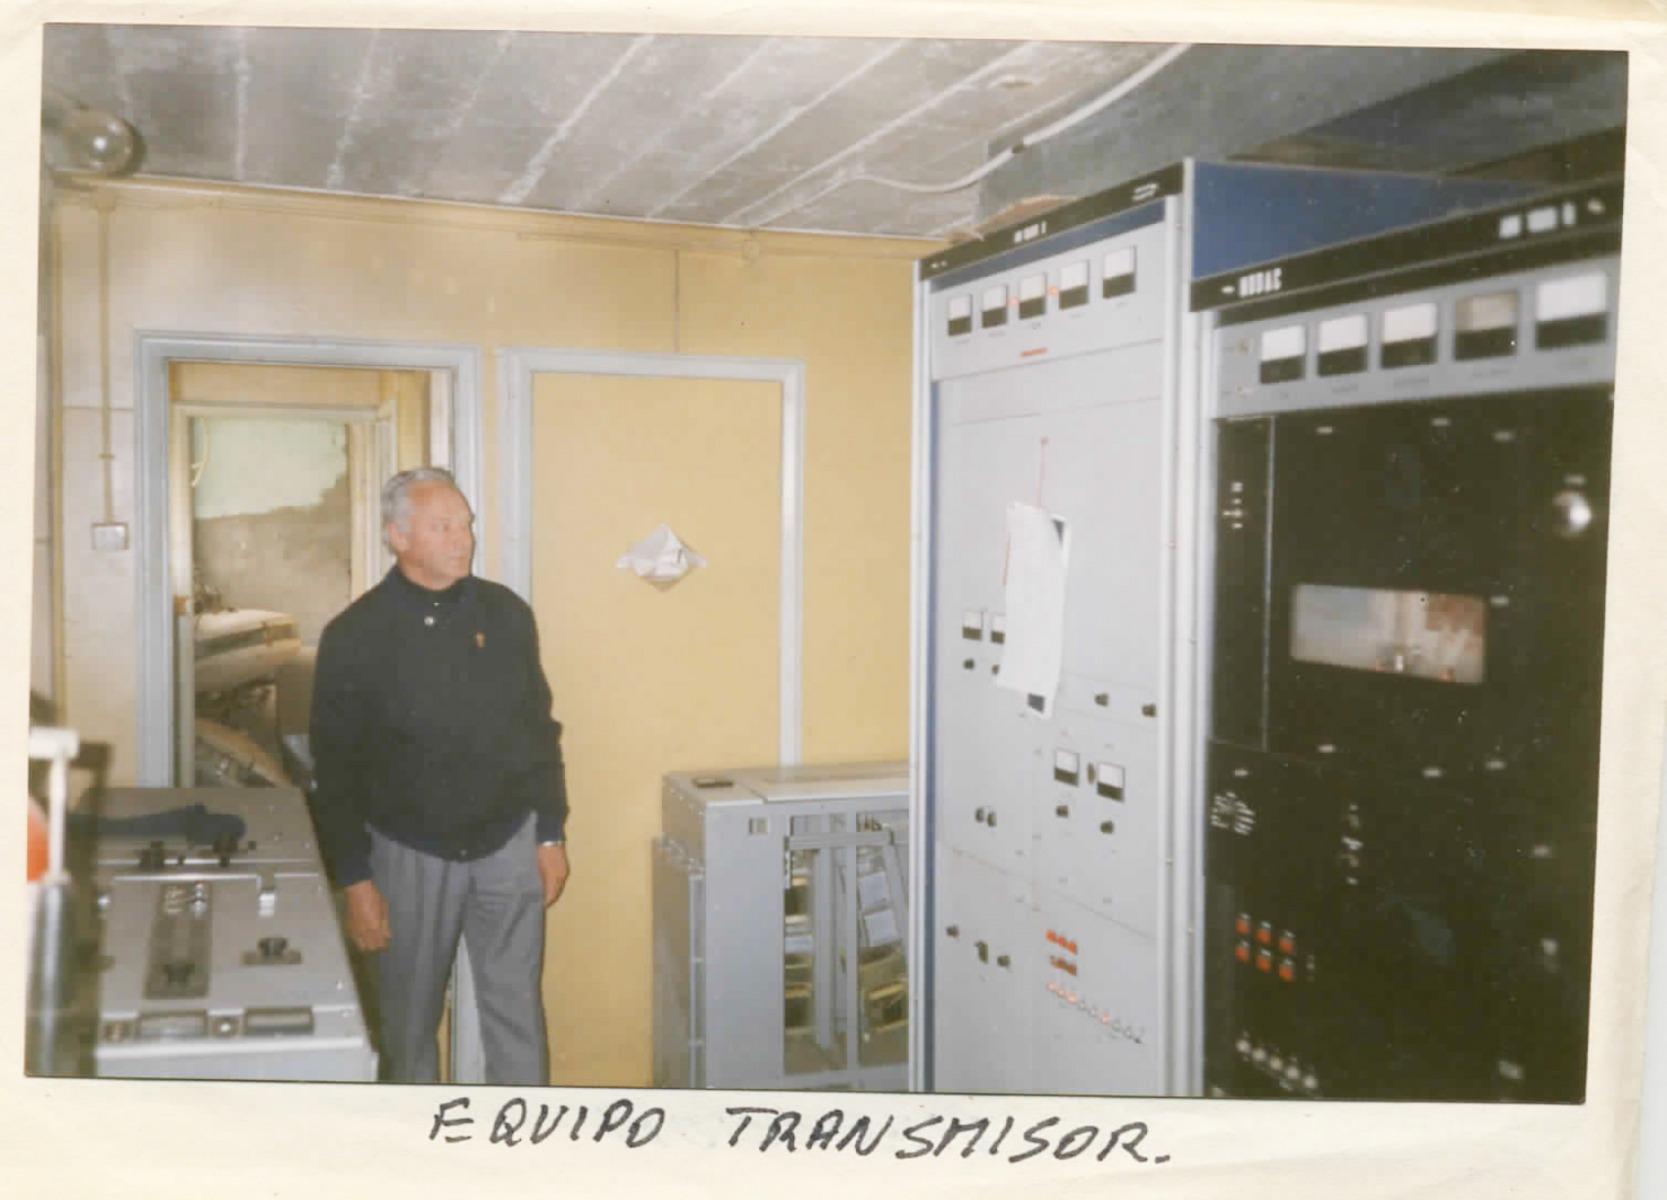 12-Radio-SMaria-equipo-transmisor-dic-95